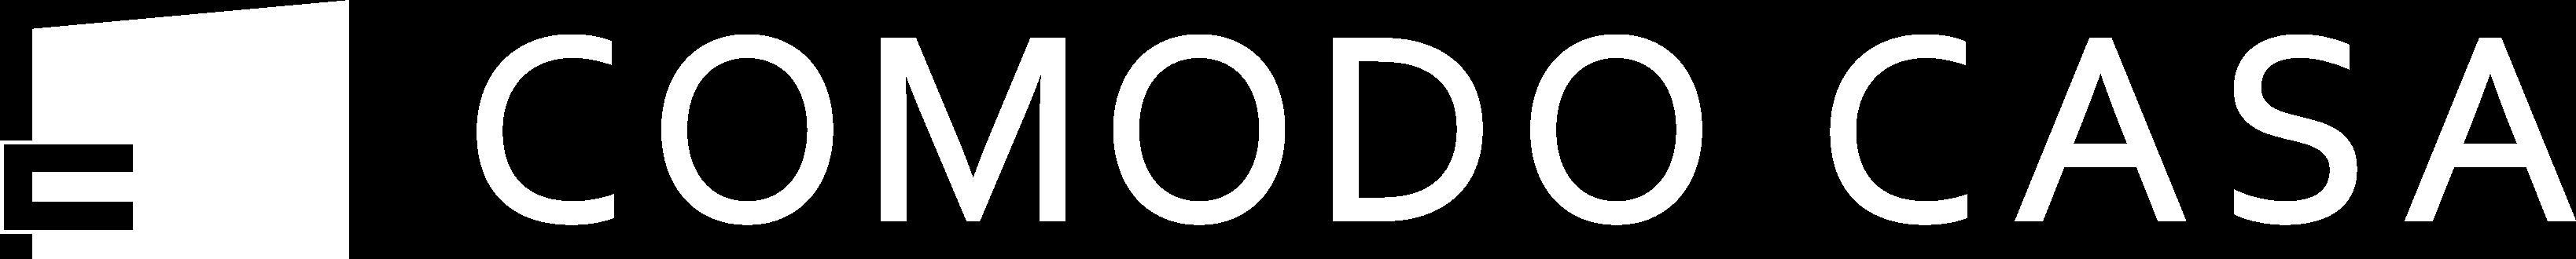 COMODO CASA(コーモド・カーサ)